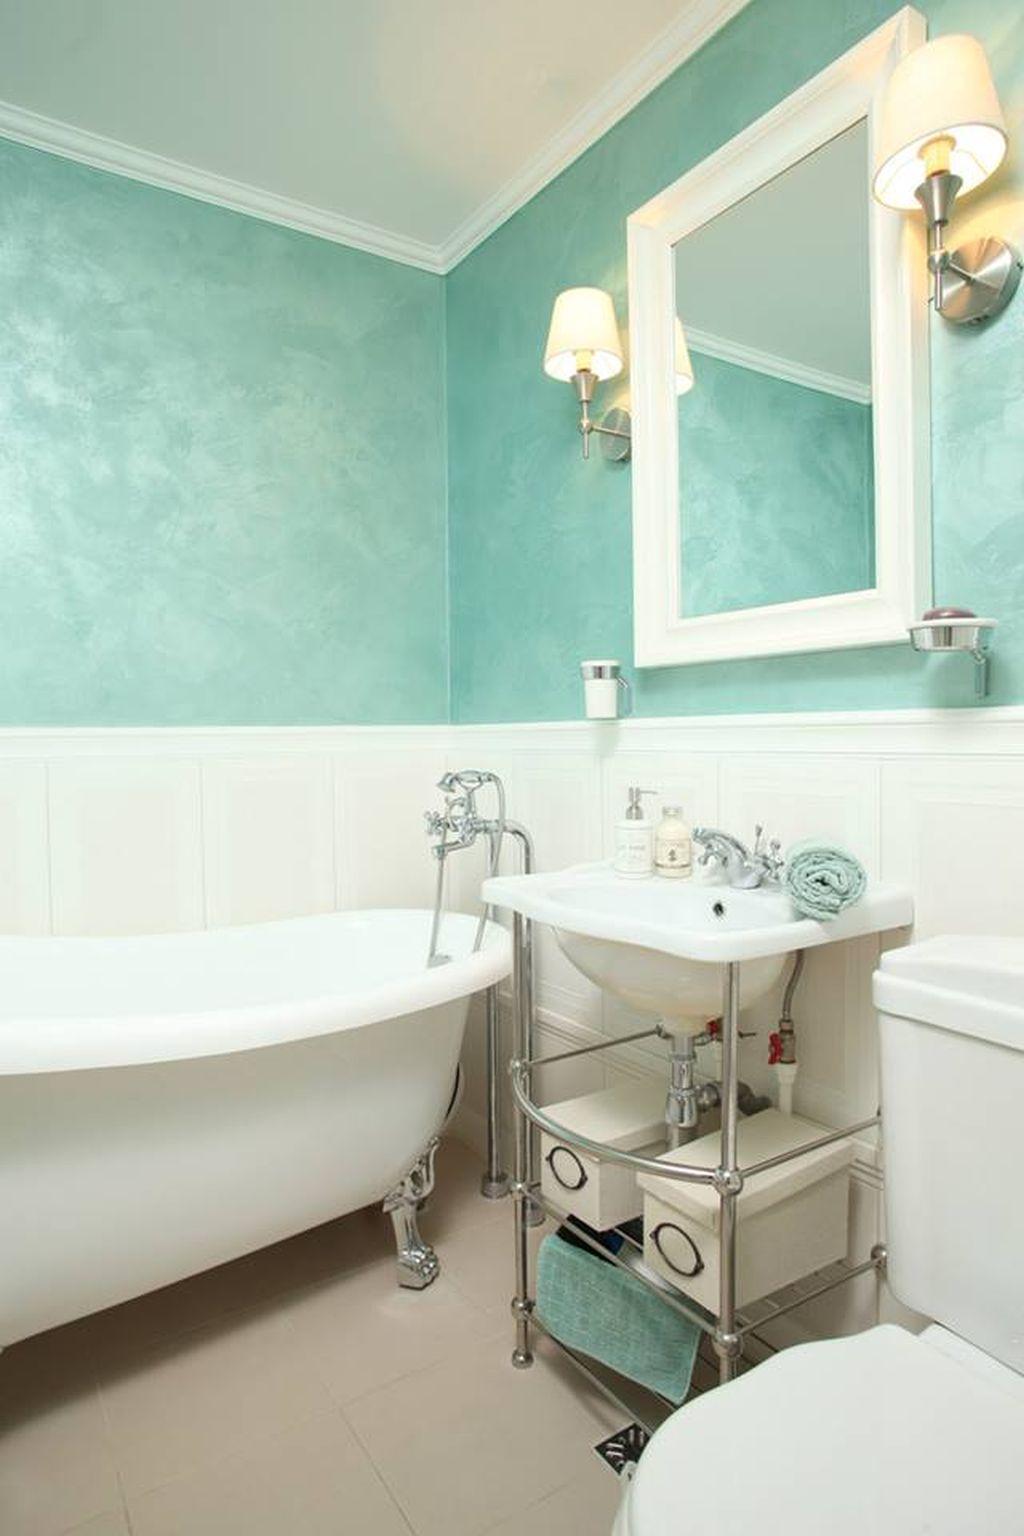 6 apartament in stil french design interior Simona Bonea